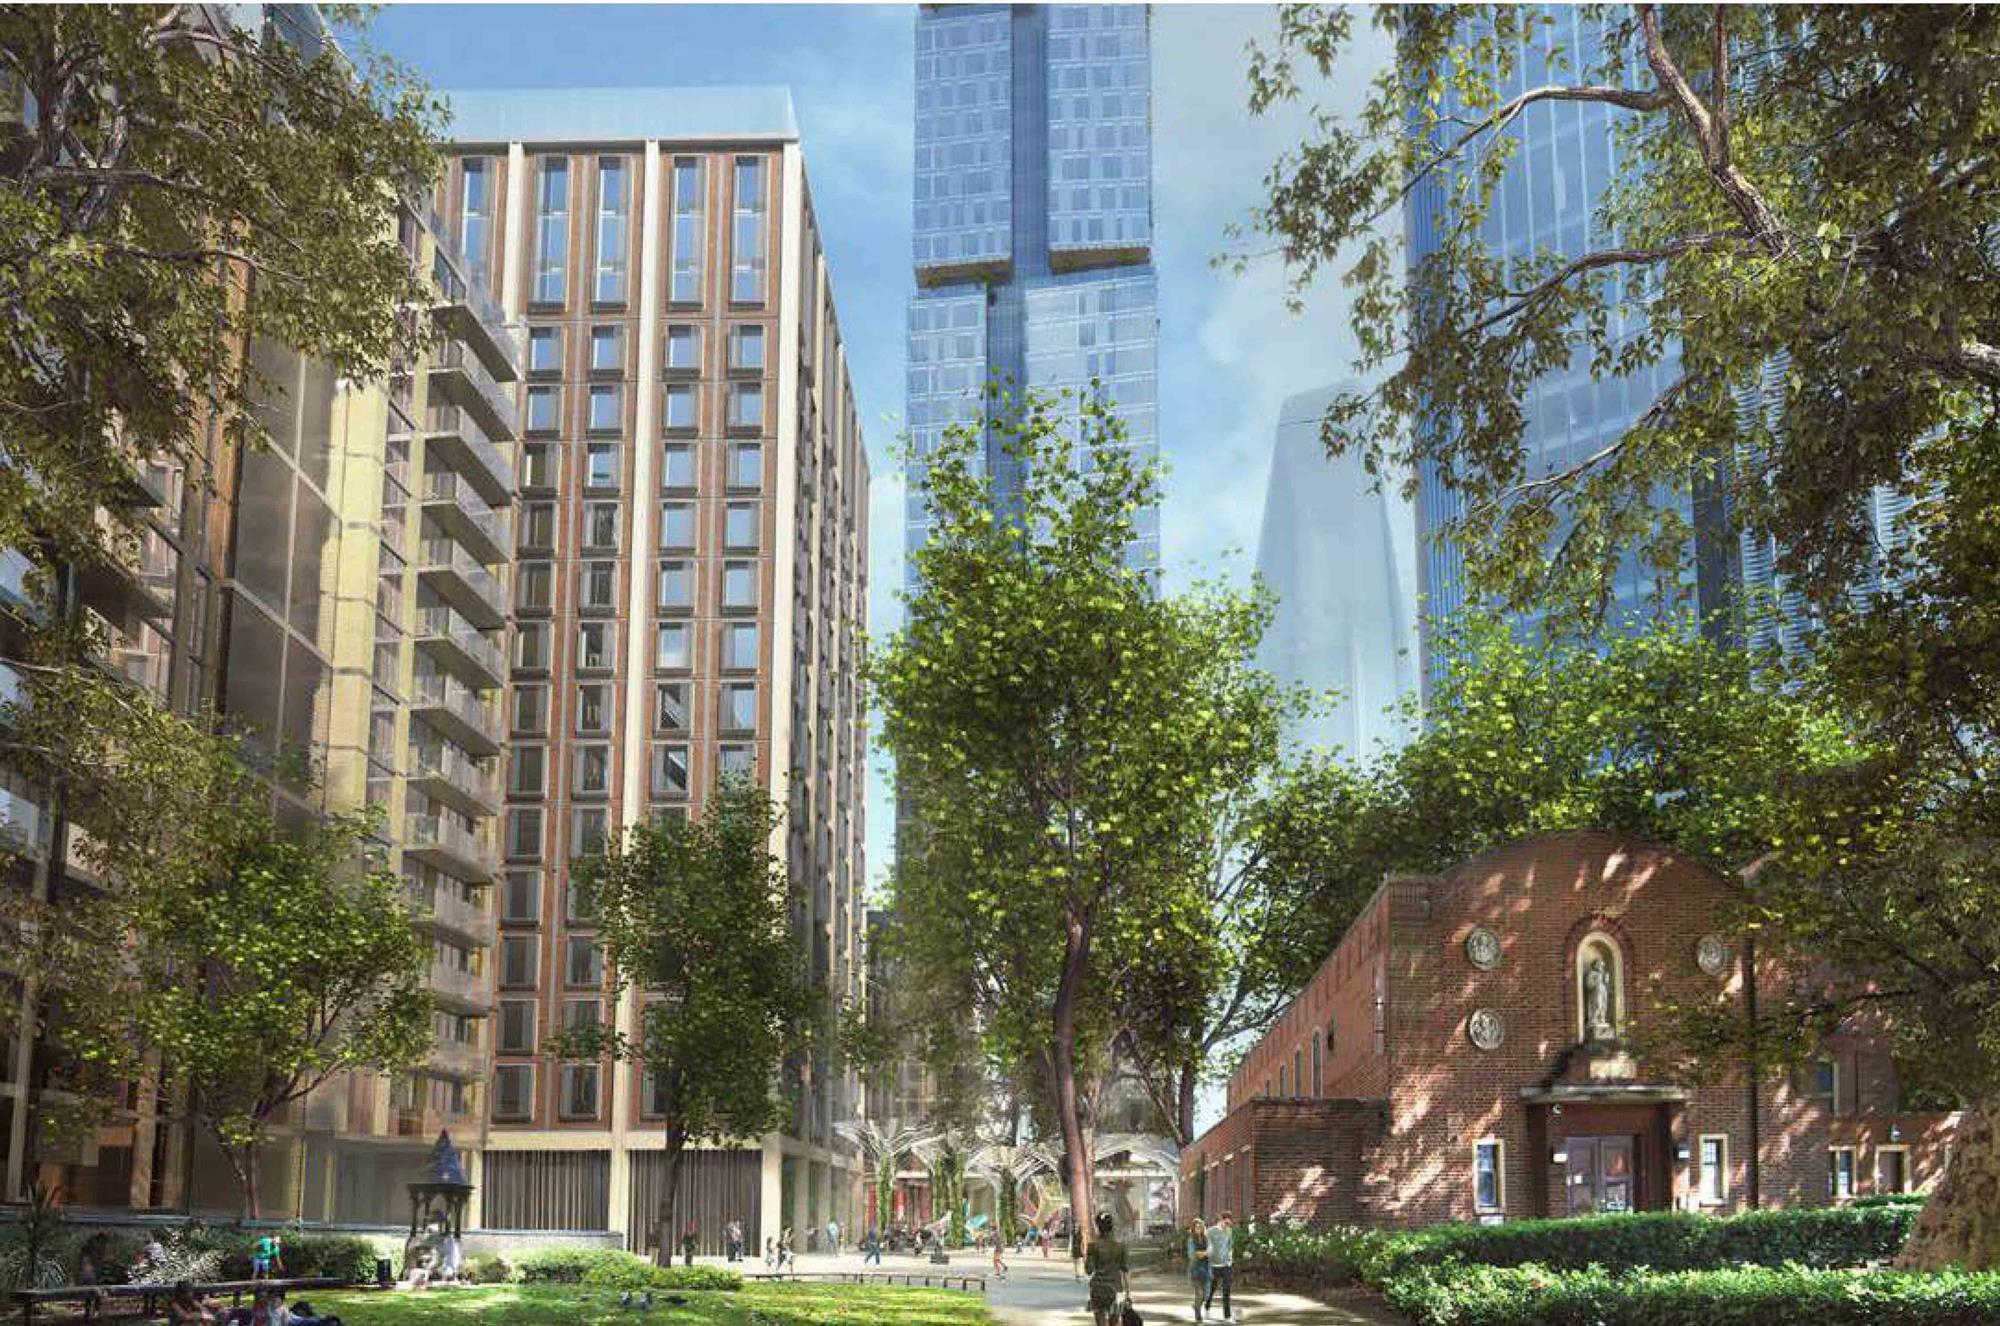 Wilkinson Eyre set to bag planning for Blackfriars Bridge tower